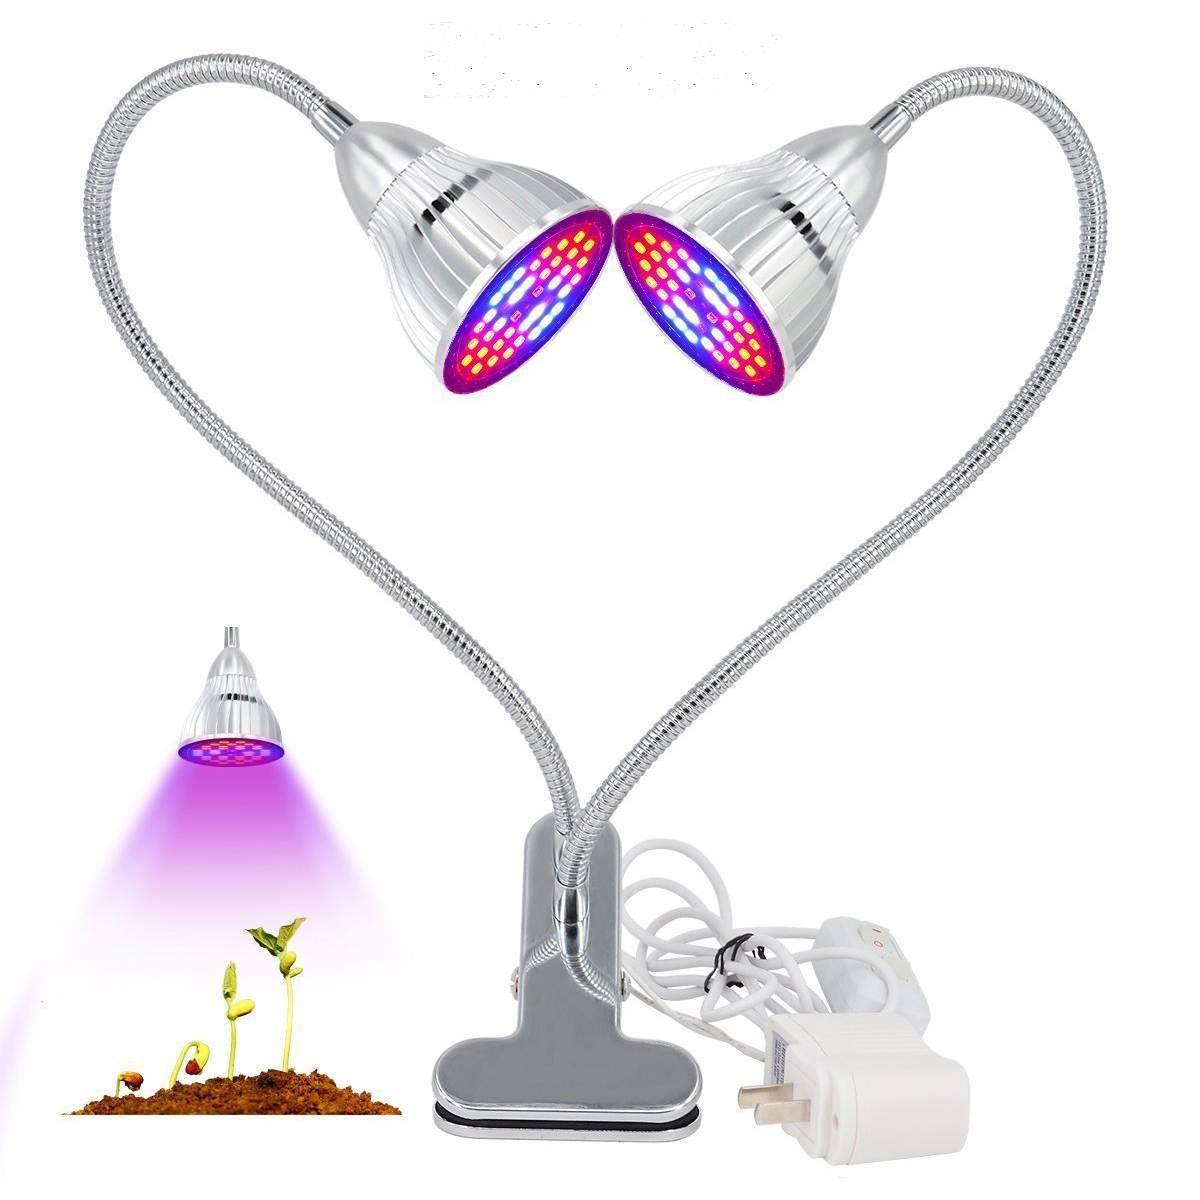 60W Dual Head LED Grow Light Full Spectrum Desk Clip On